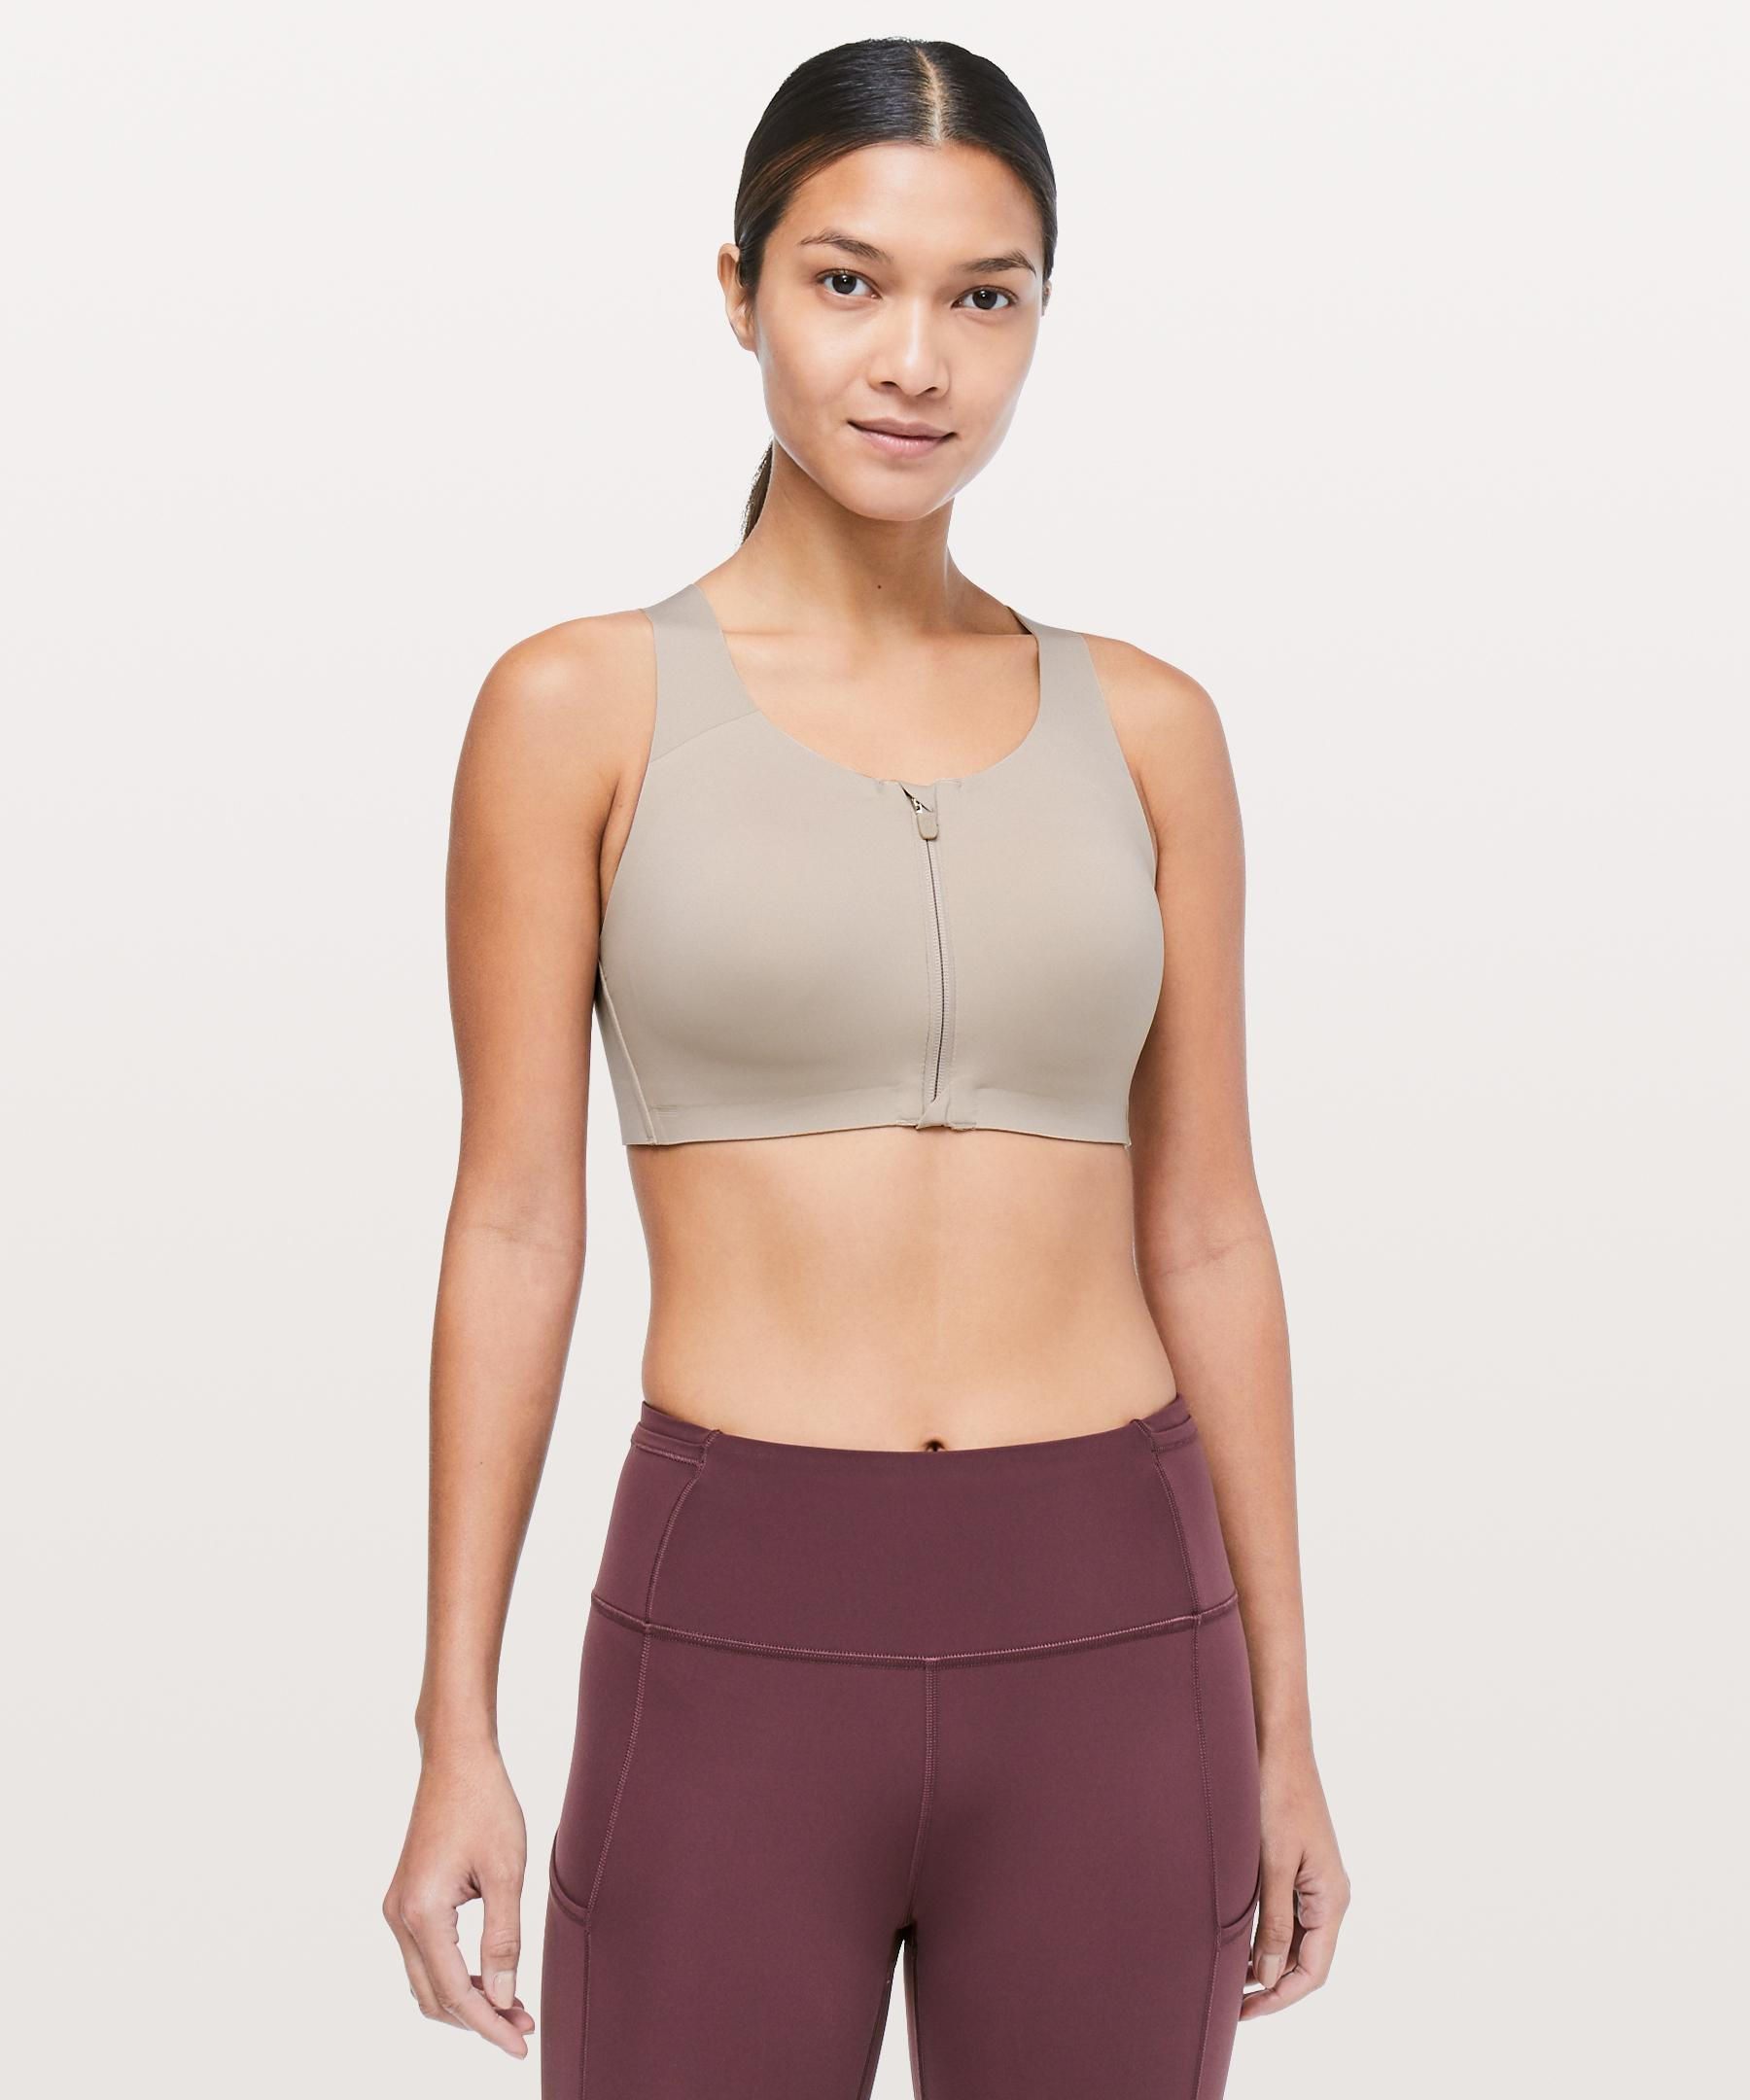 0cc104053d lululemon athletica. Women s Enlite Bra  zip Front